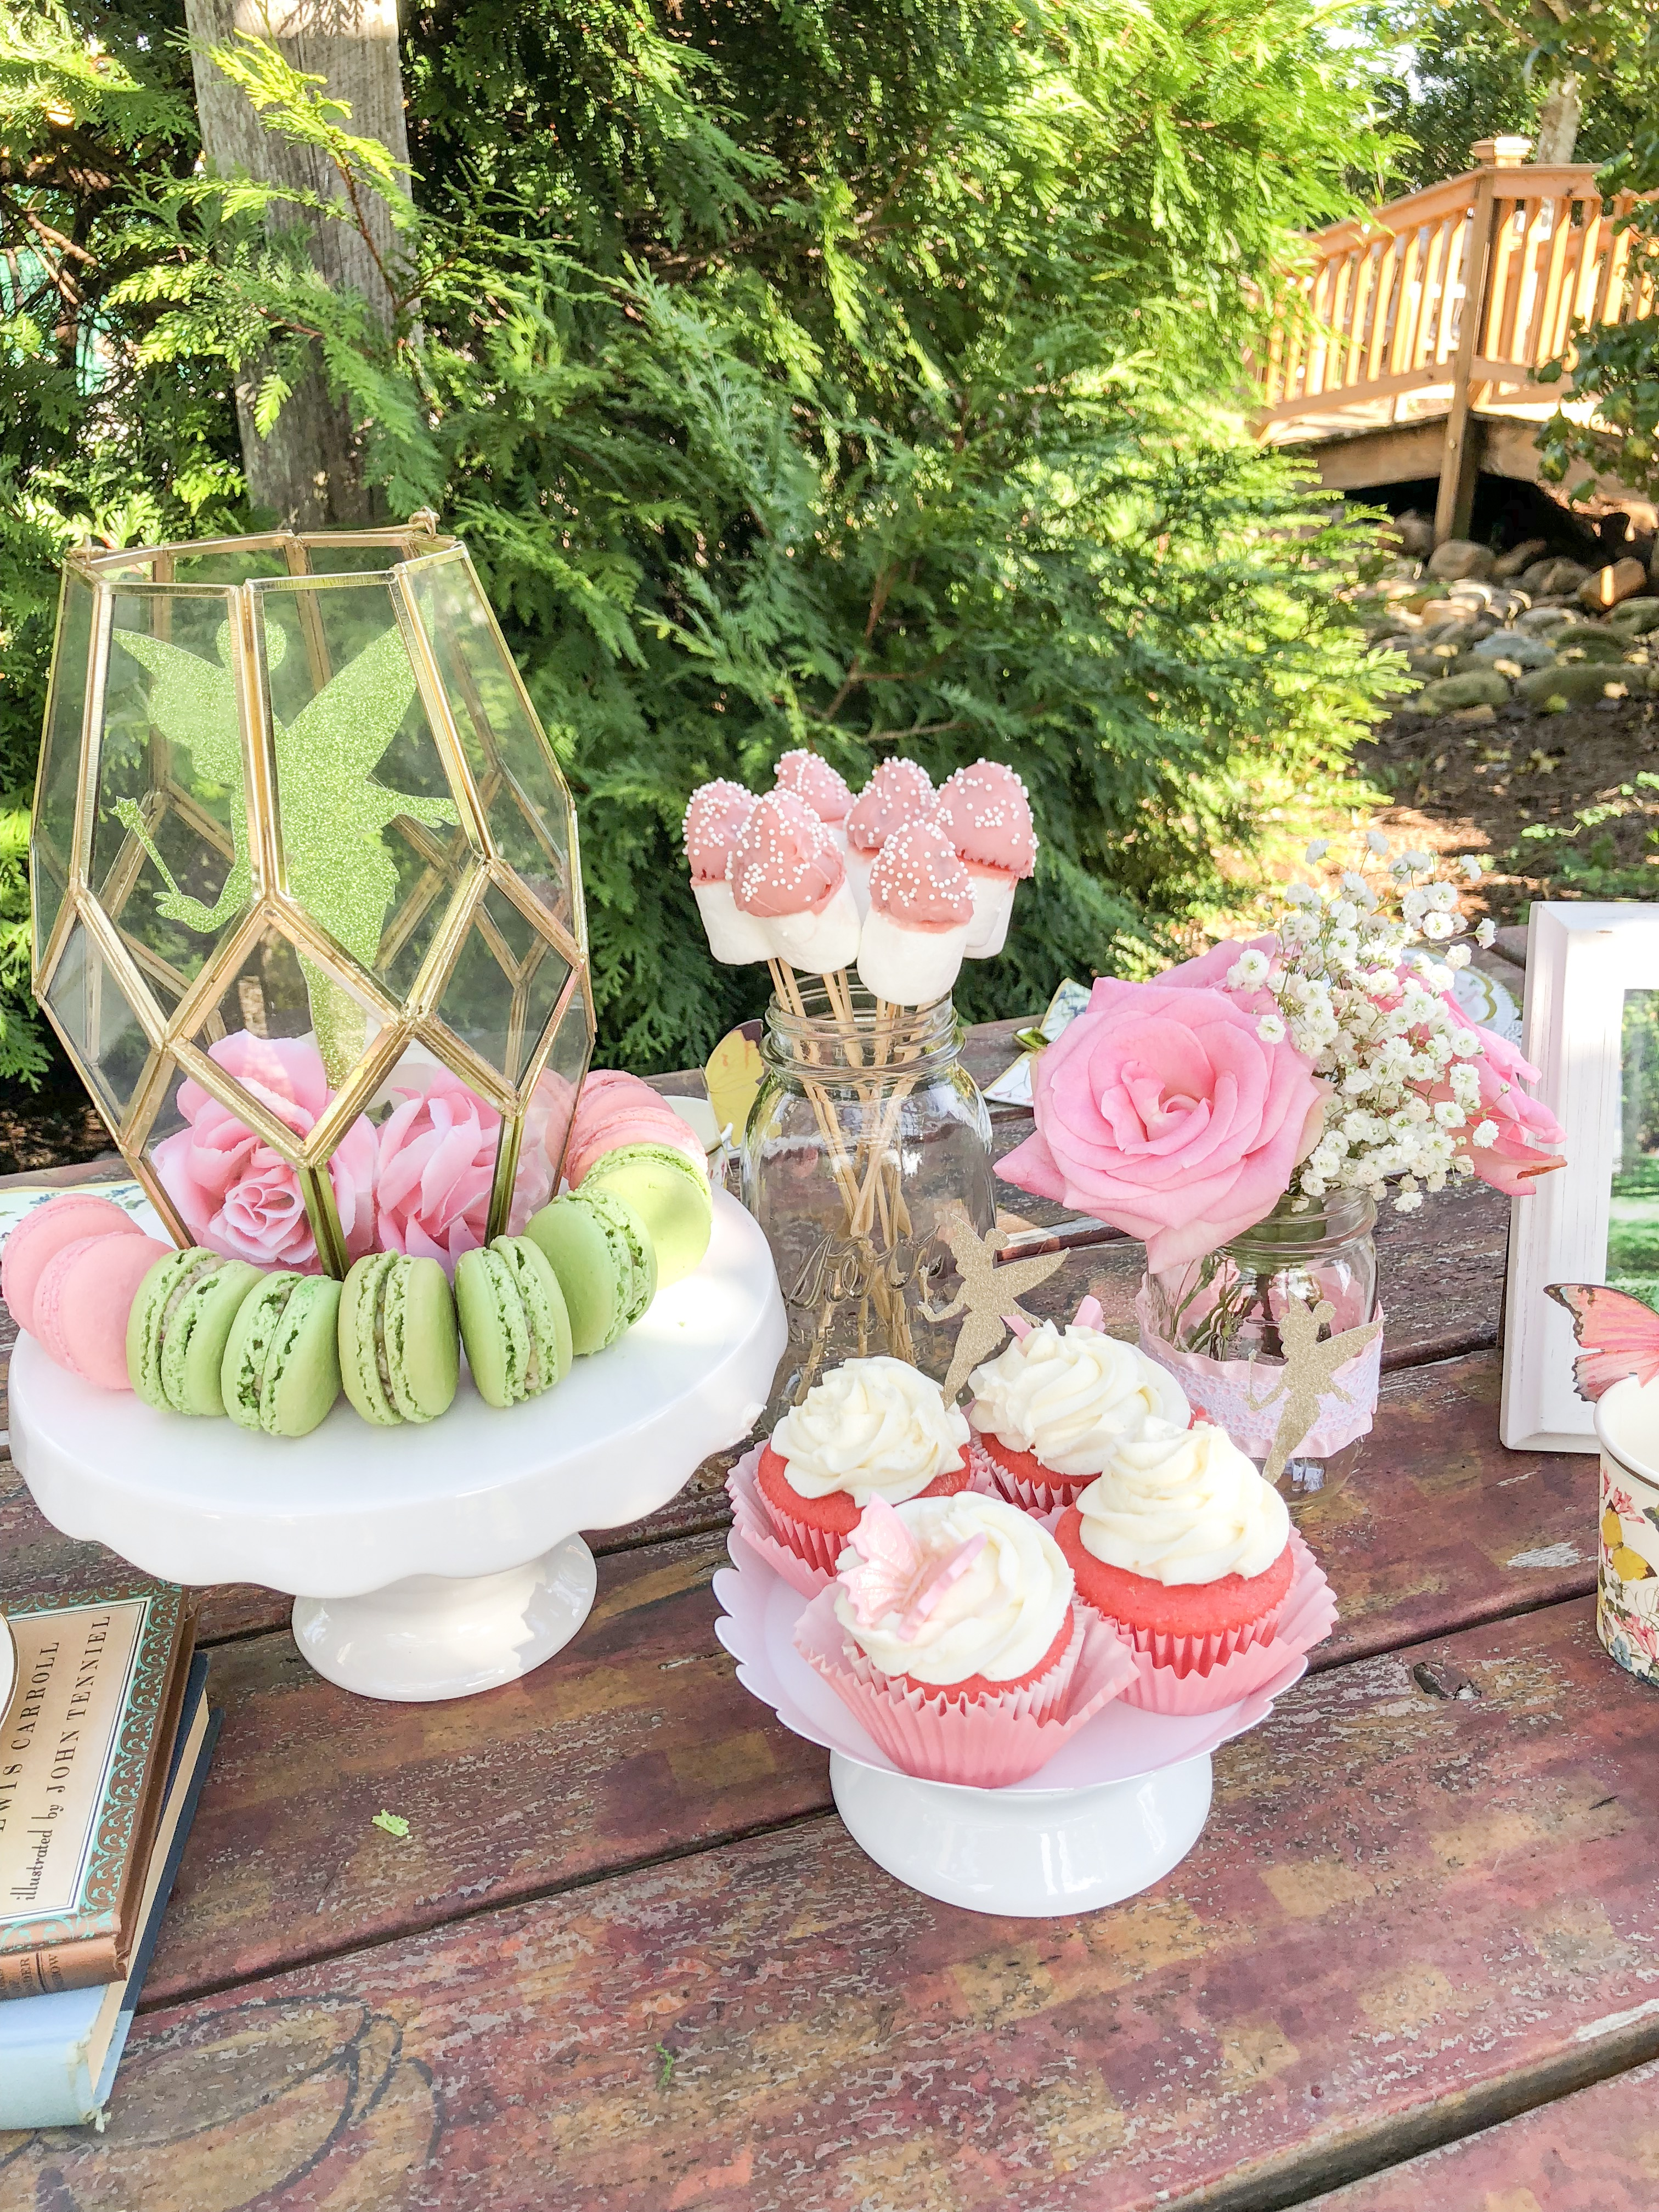 Raleys fairy garden tea party poppy grace fairy garden tea party ideas for girls fairy birthday party decorations tea party food izmirmasajfo